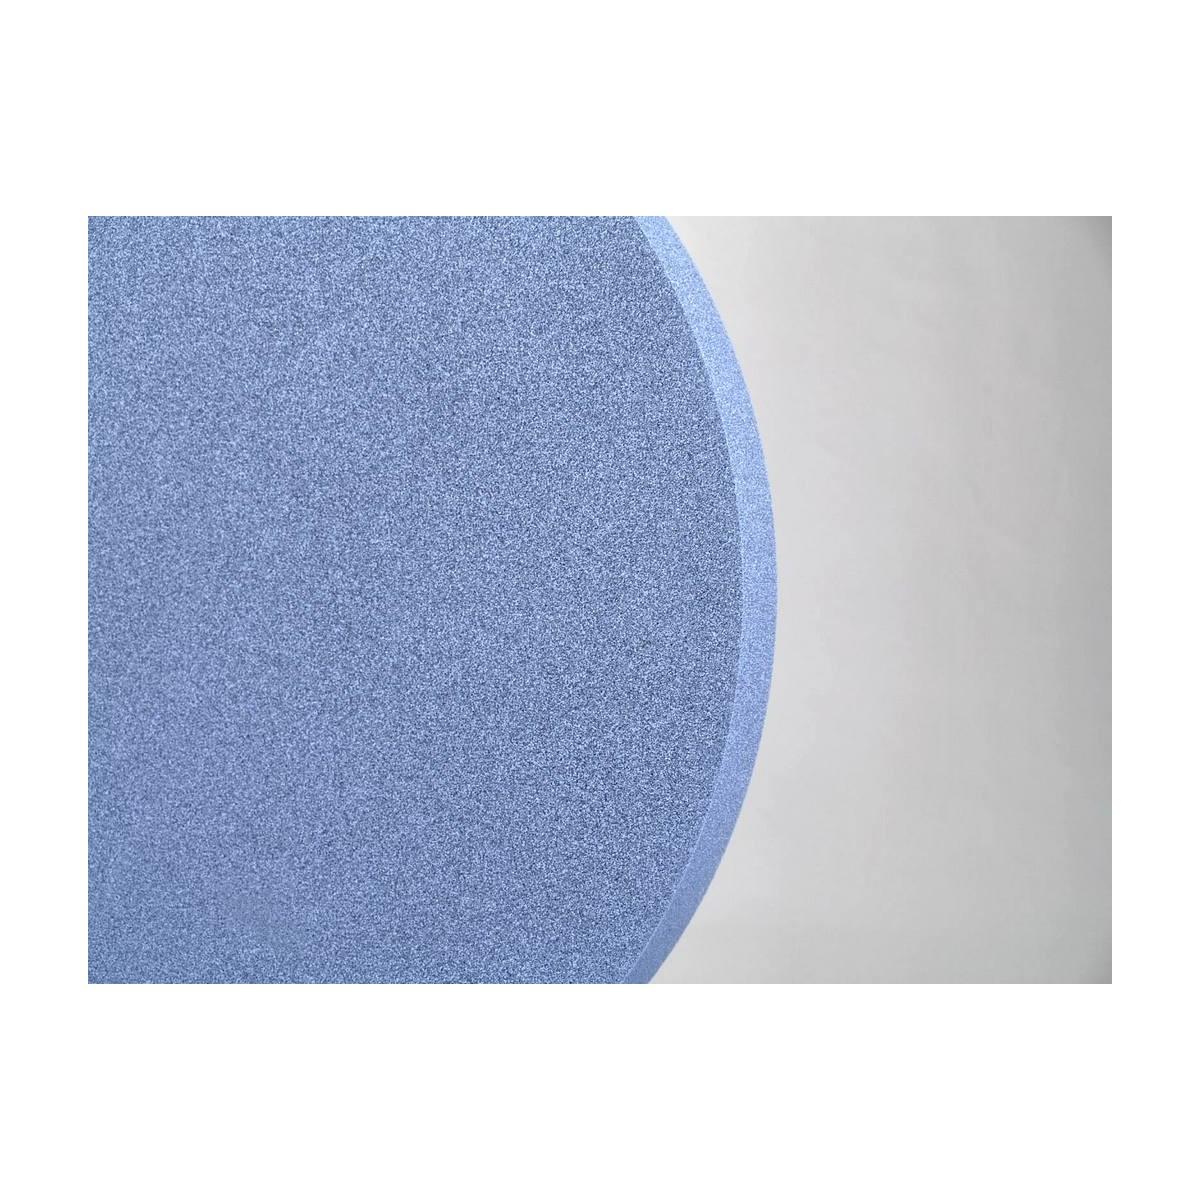 detalle circulo acustico light blue